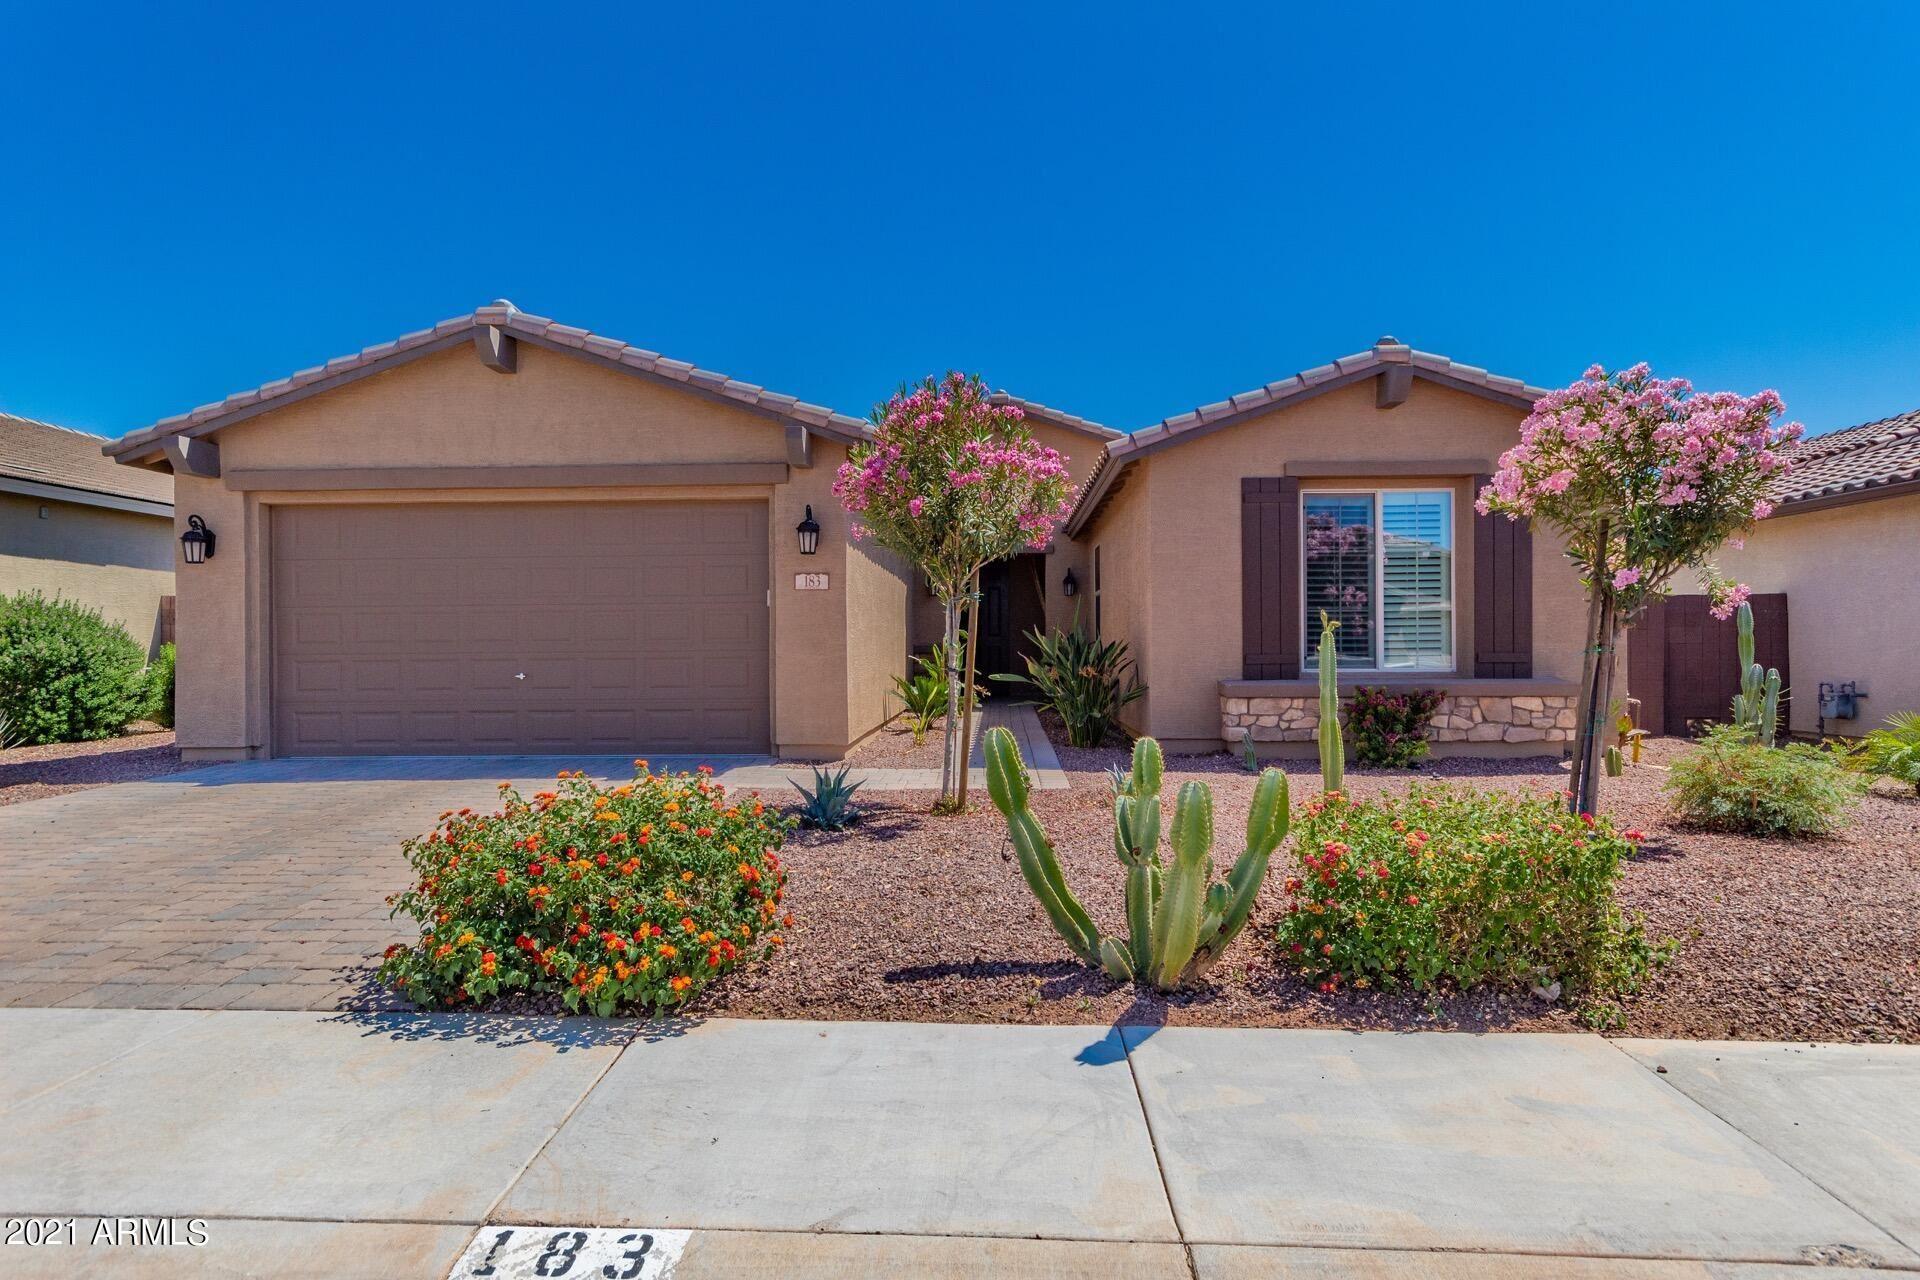 183 W EVERGREEN PEAR Avenue, San Tan Valley, AZ 85140 - MLS#: 6231106